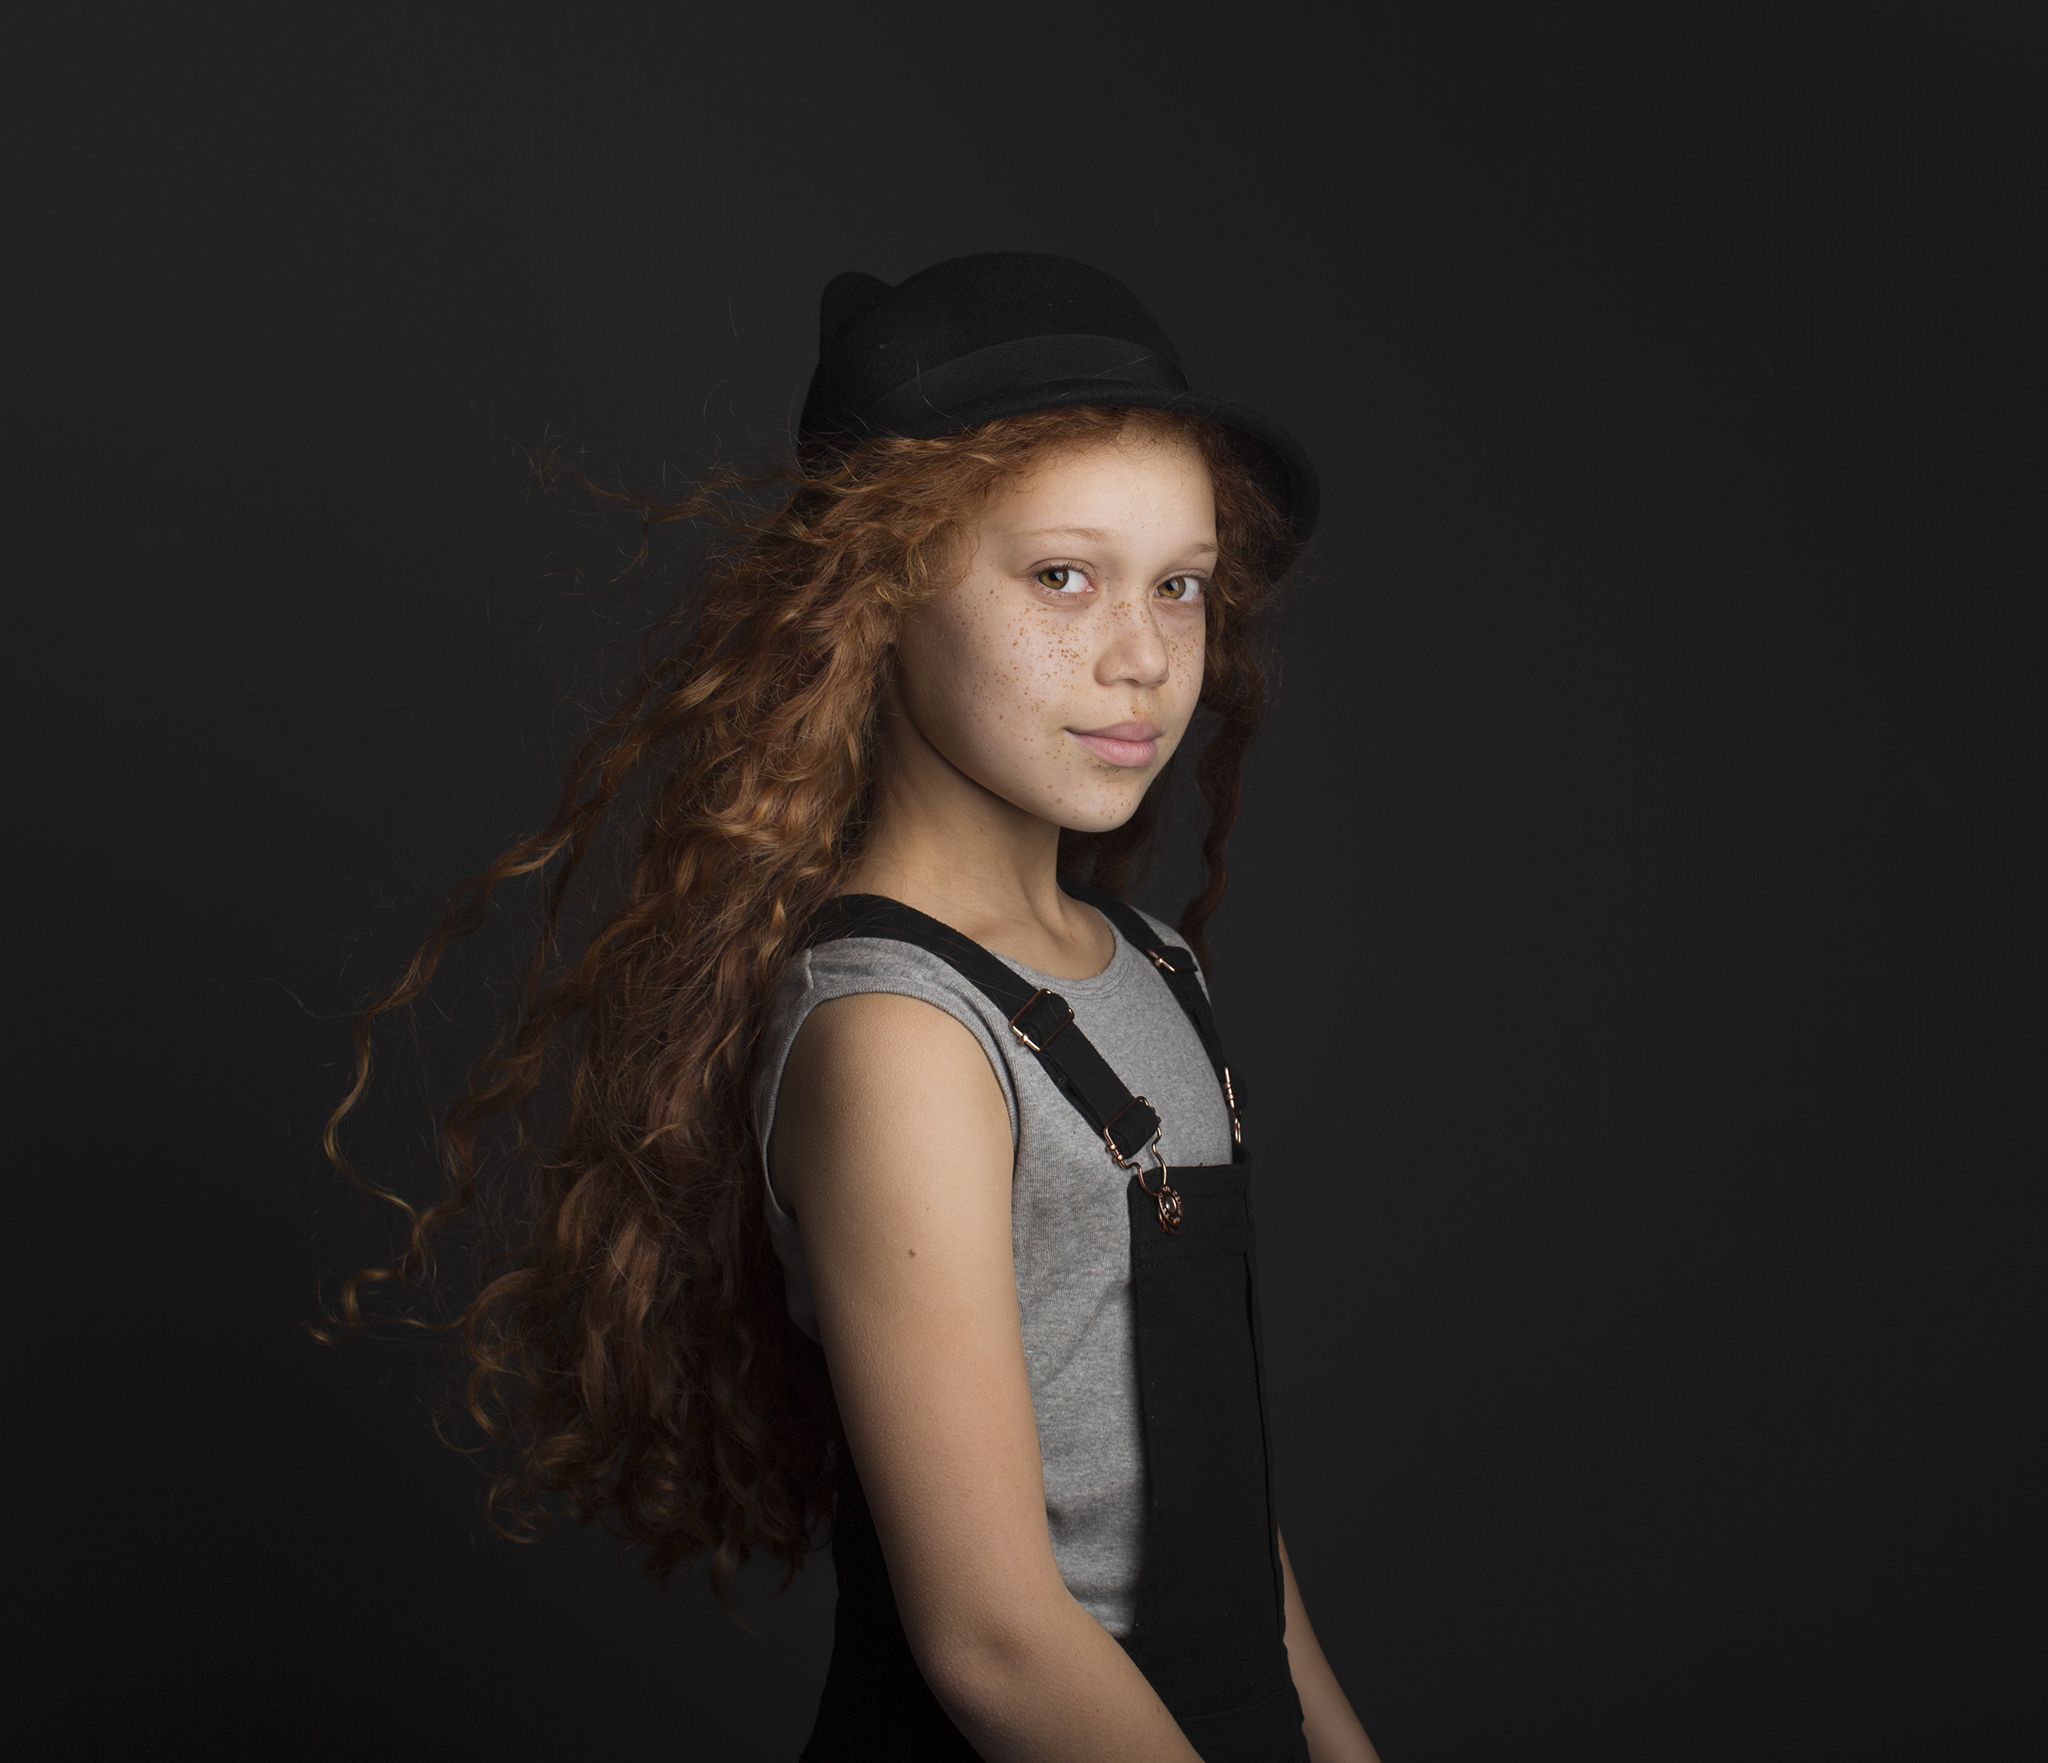 elizabethg_photography_hertfordshire_fineart_child_portrait_model_tiarna_williams_01.jpg